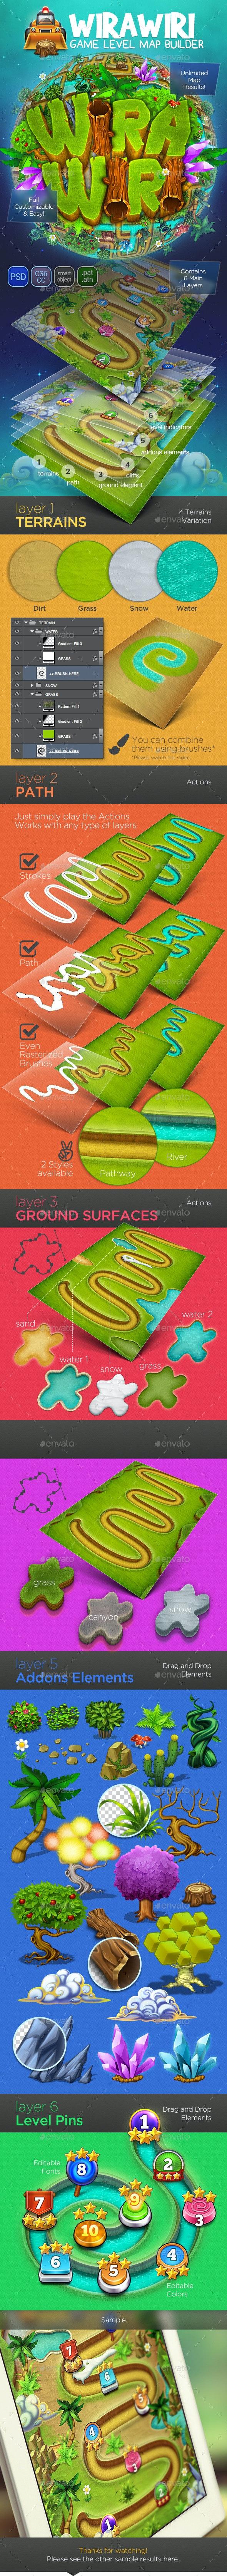 Wirawiri: Game Level Map Builder - Game Kits Game Assets